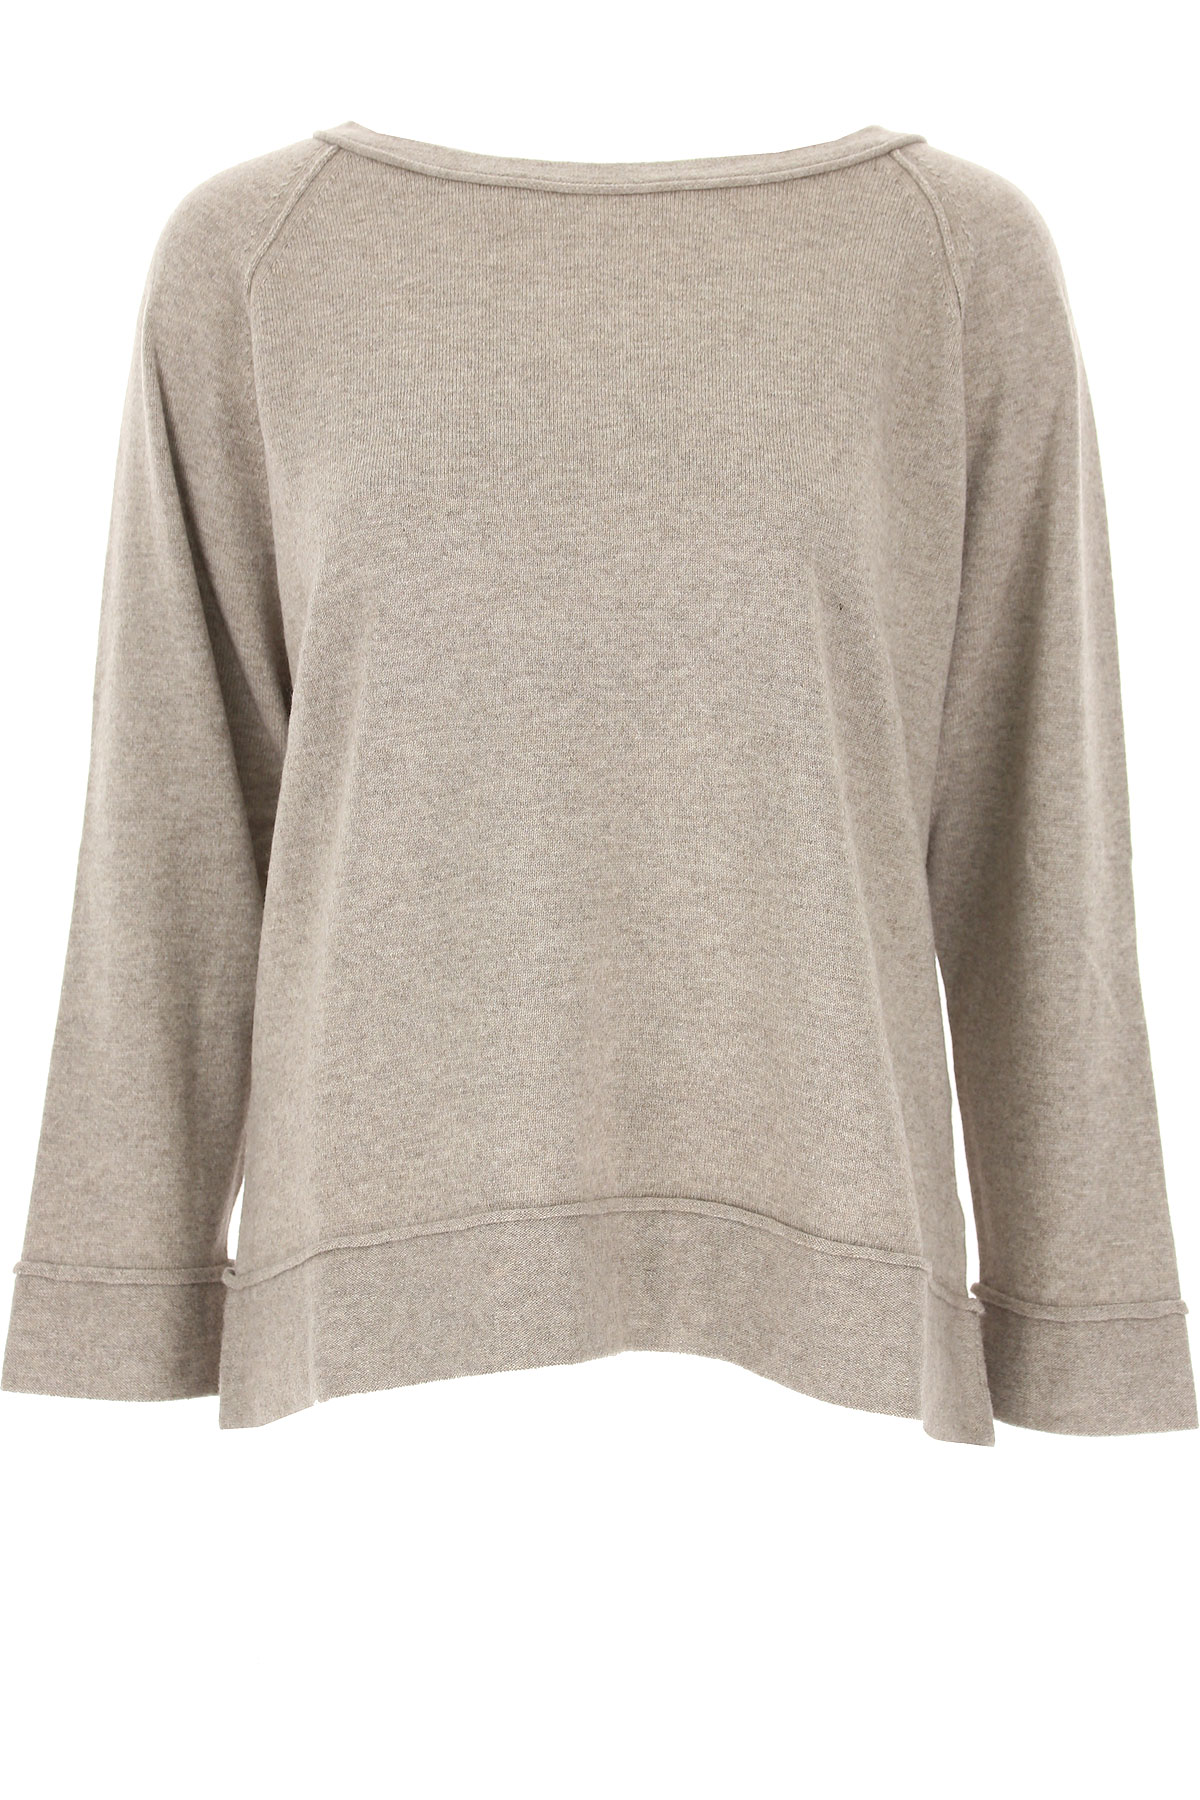 Image of Lamberto Losani Sweater for Women Jumper, Taupe, Virgin wool, 2017, 2 4 6